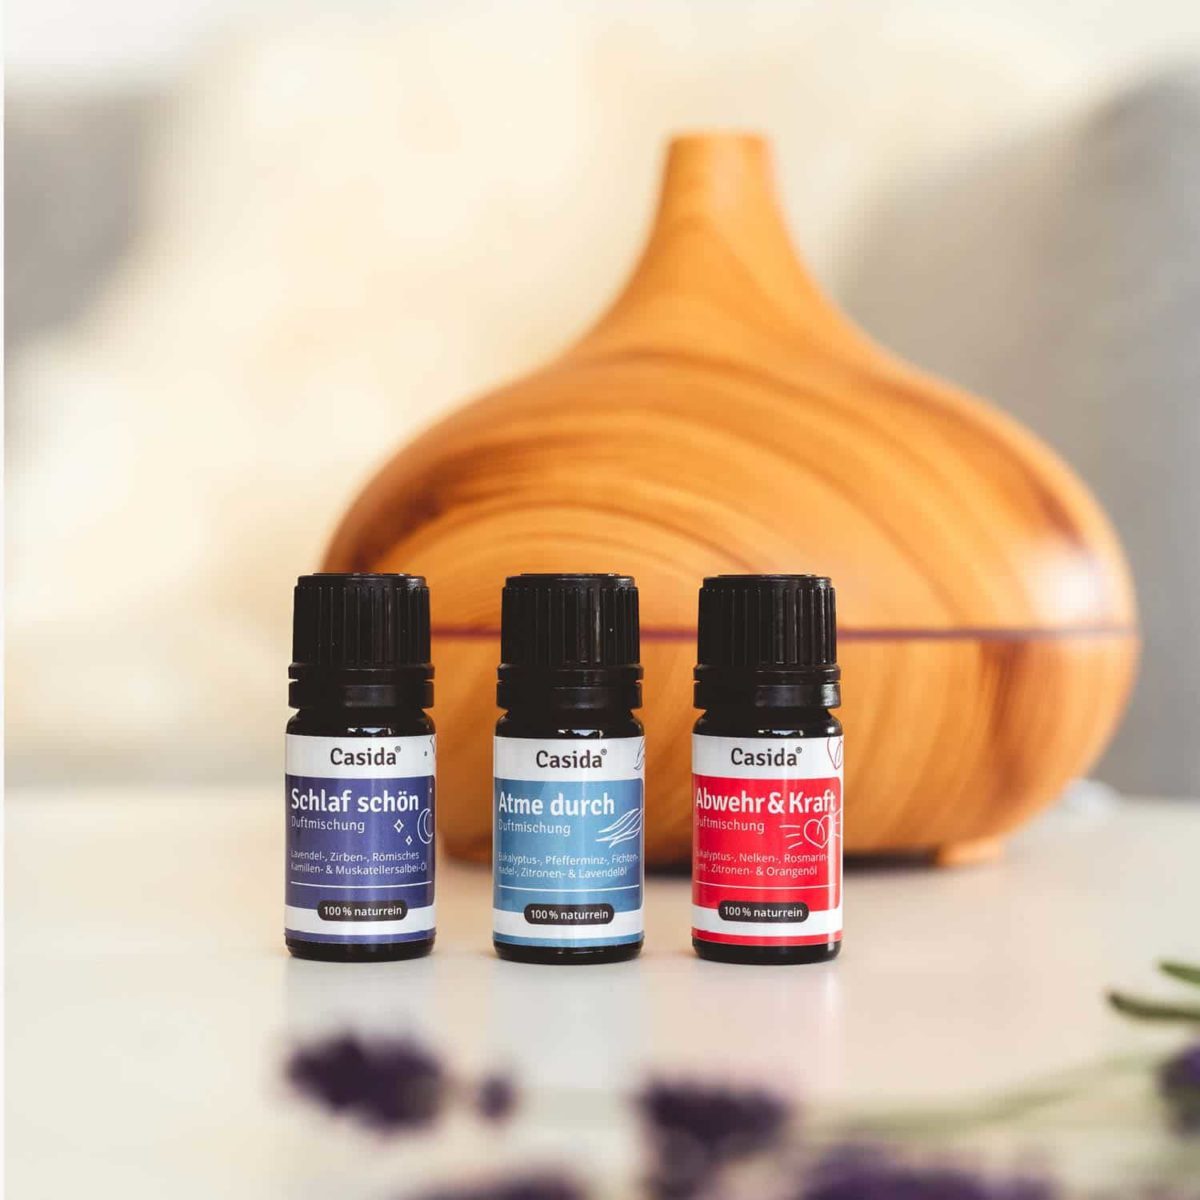 Casida Duftmischung Atme durch - 5 ml 16913317 PZN Apotheke Belebend Aromatherapie Aromapflege Reinigung Corona Mund Nasen Schutz